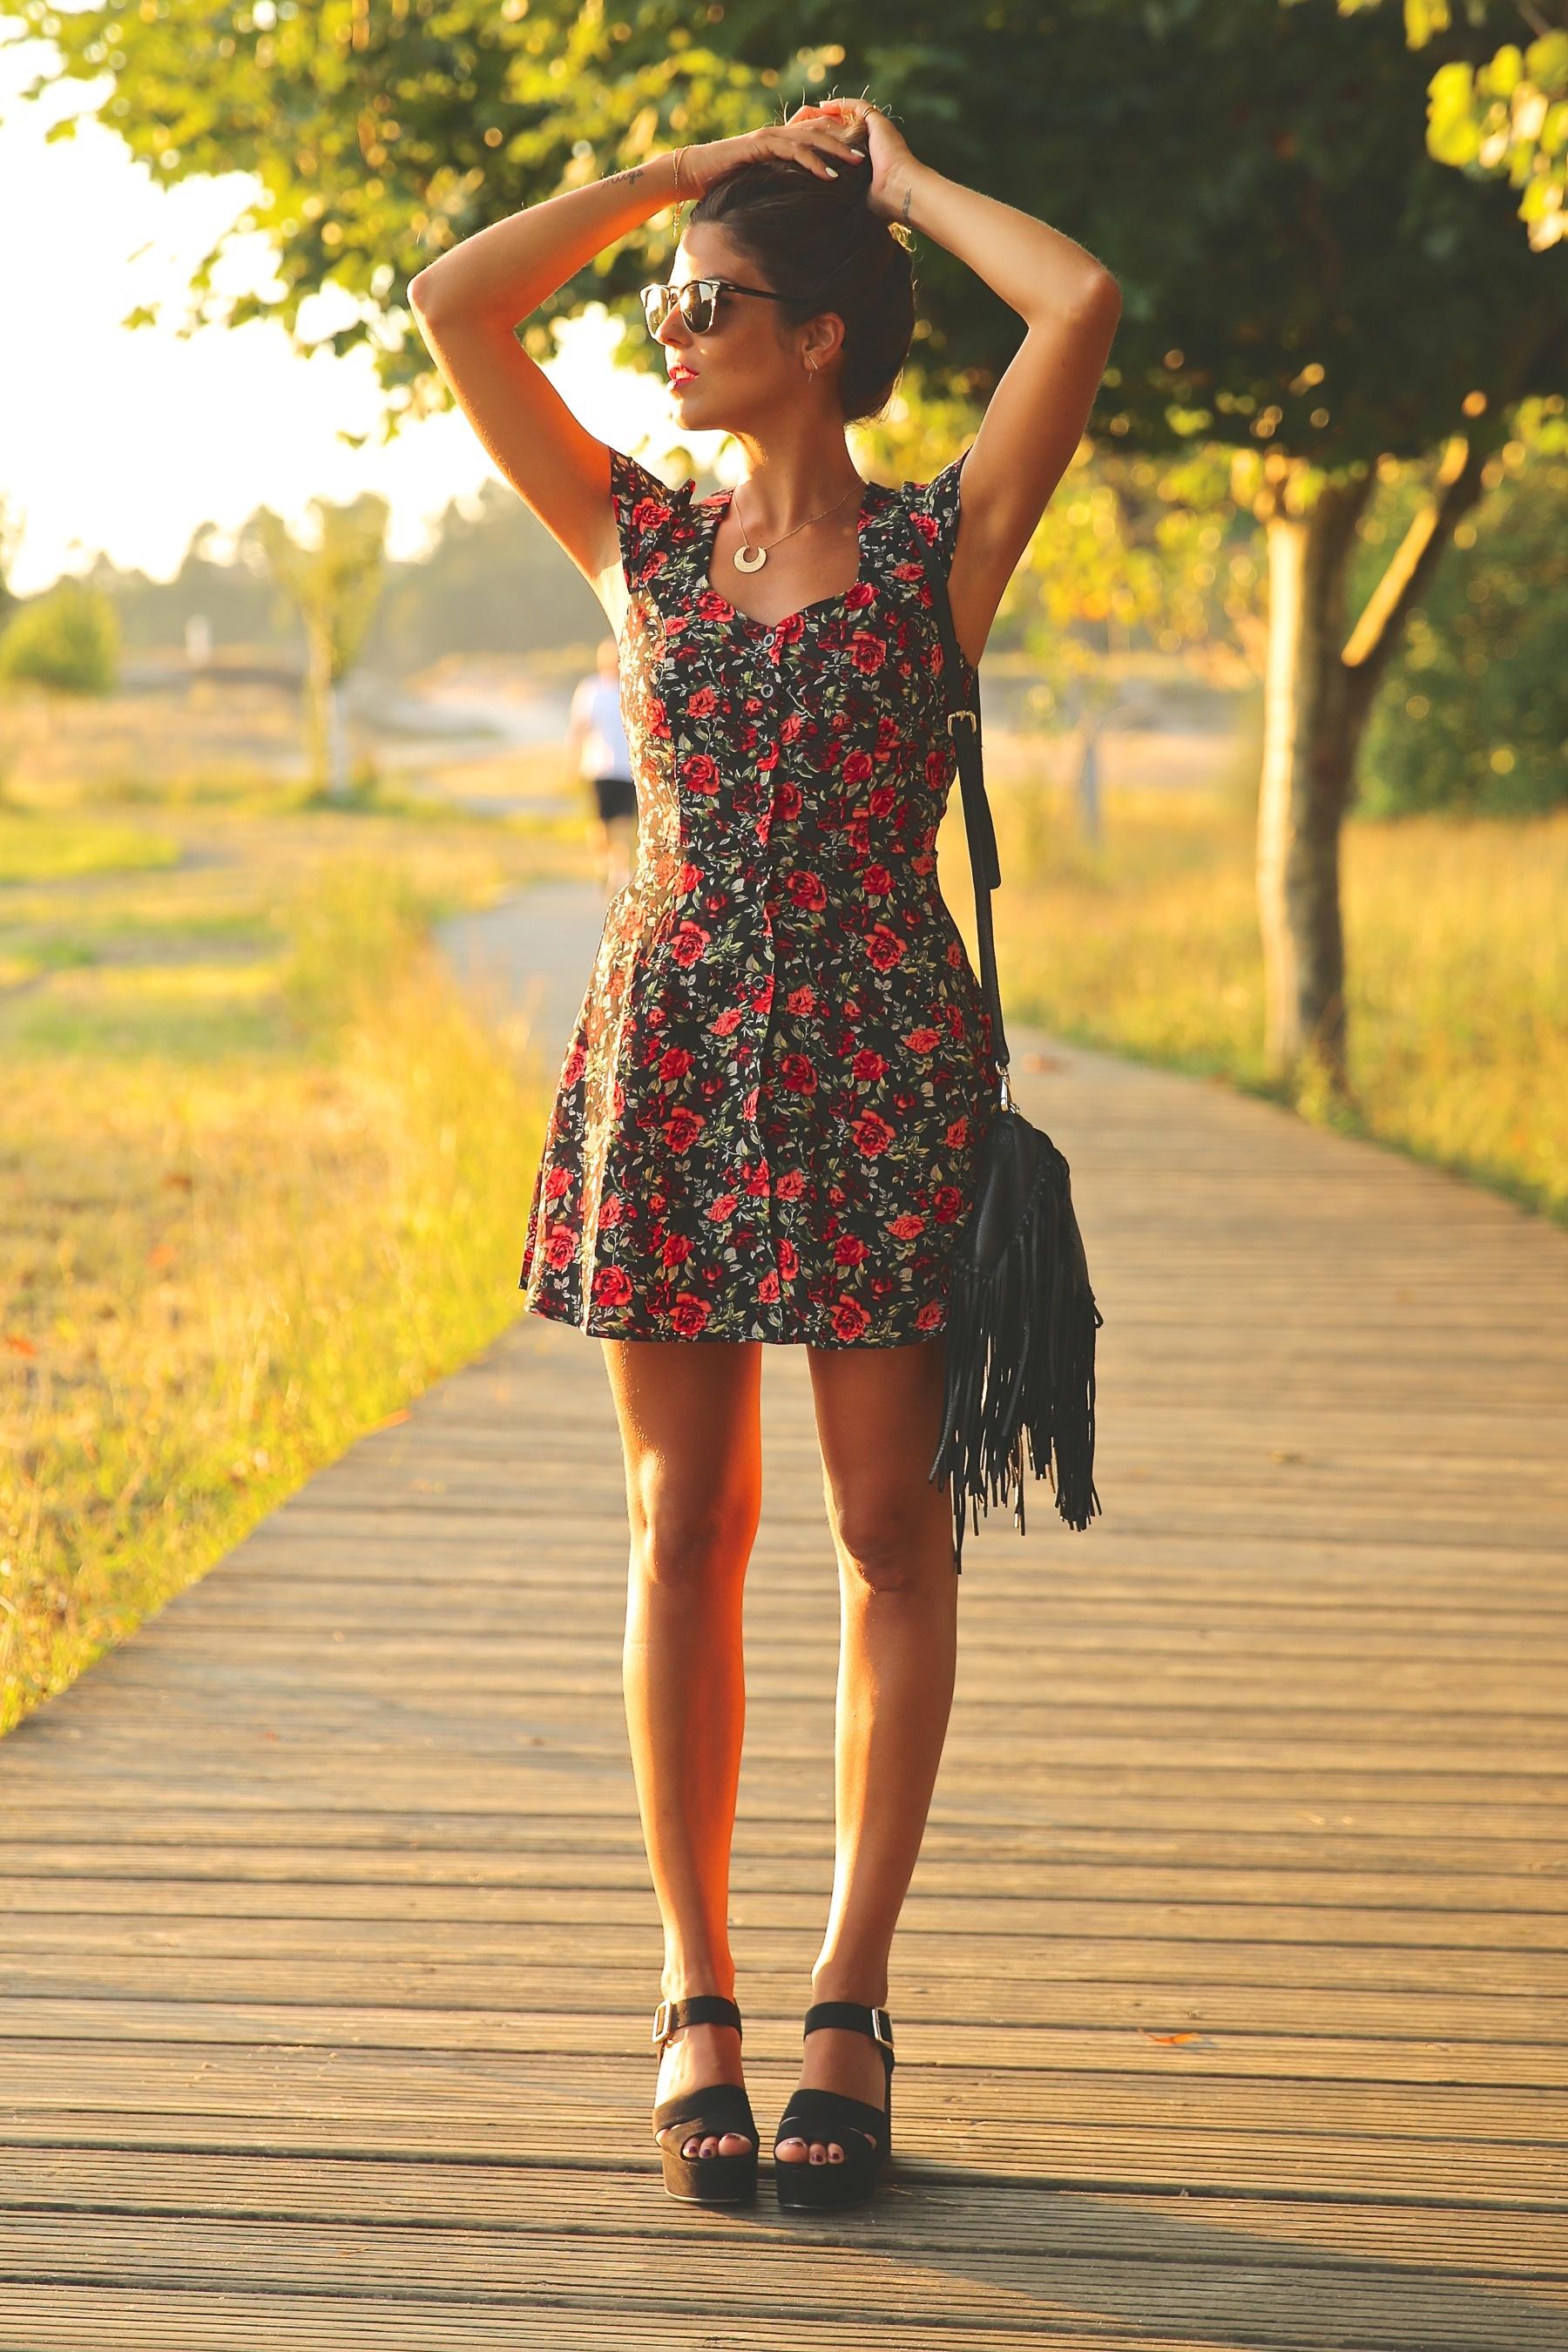 trendy_taste-look-outfit-street_style-ootd-blog-blogger-fashion_spain-moda_españa-flower_print-dress-vestido-flores-sandalias_negras-black_sandals-platforms-sunset-playa-beach-summer-13